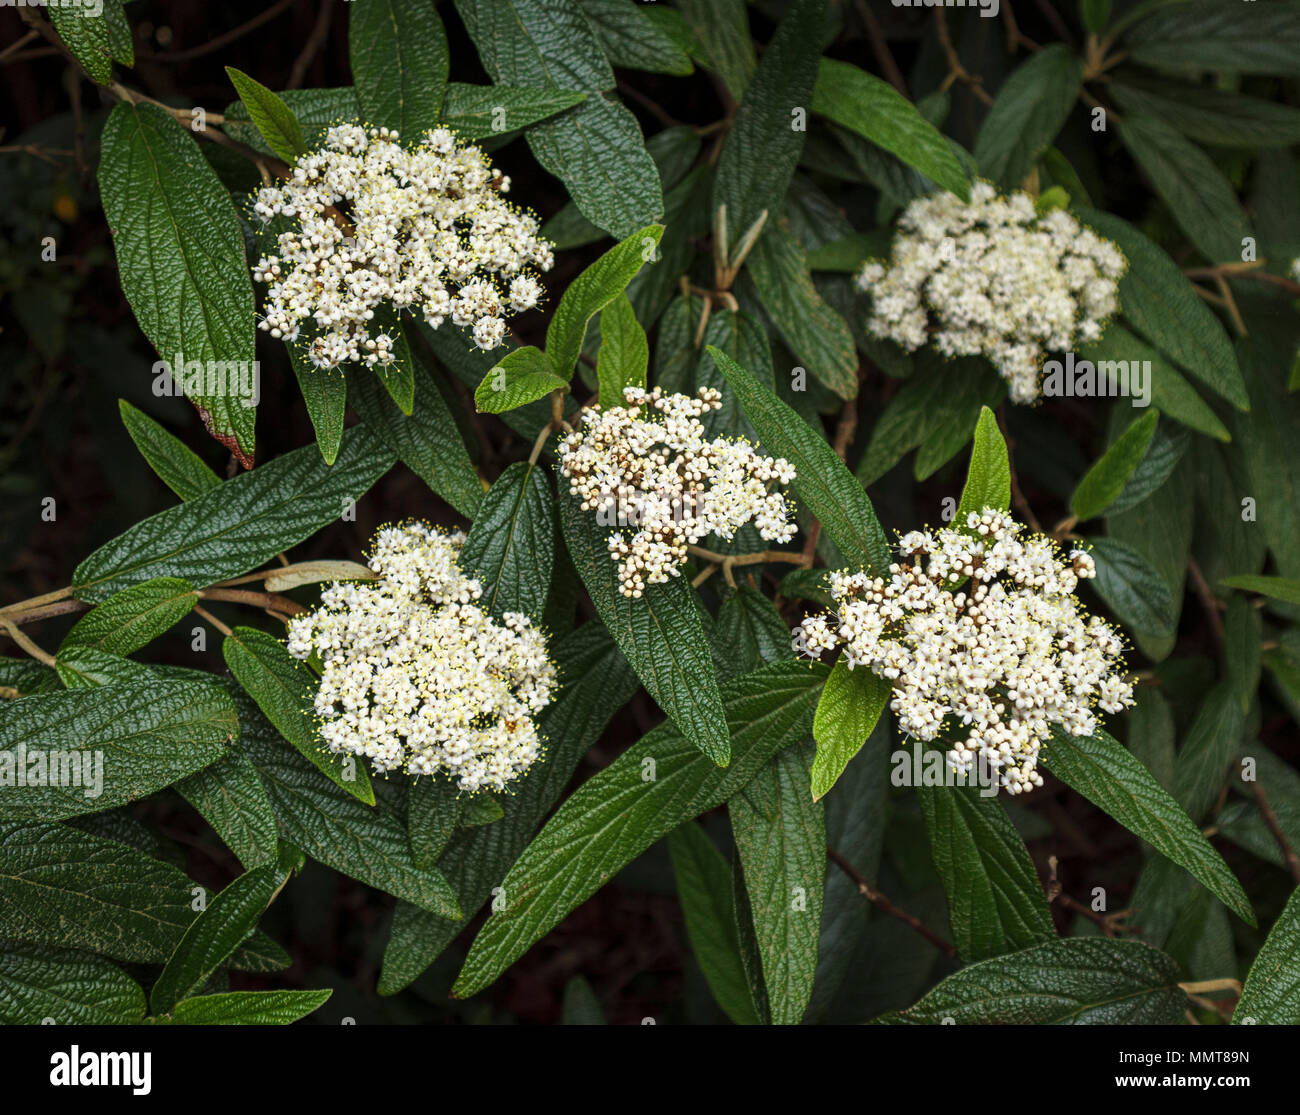 Small, delicate white viburnum (Viburnum rhytidophyllum) flowers, an evergreen shrub flowering in spring in a garden in Surrey, southern England, UK - Stock Image